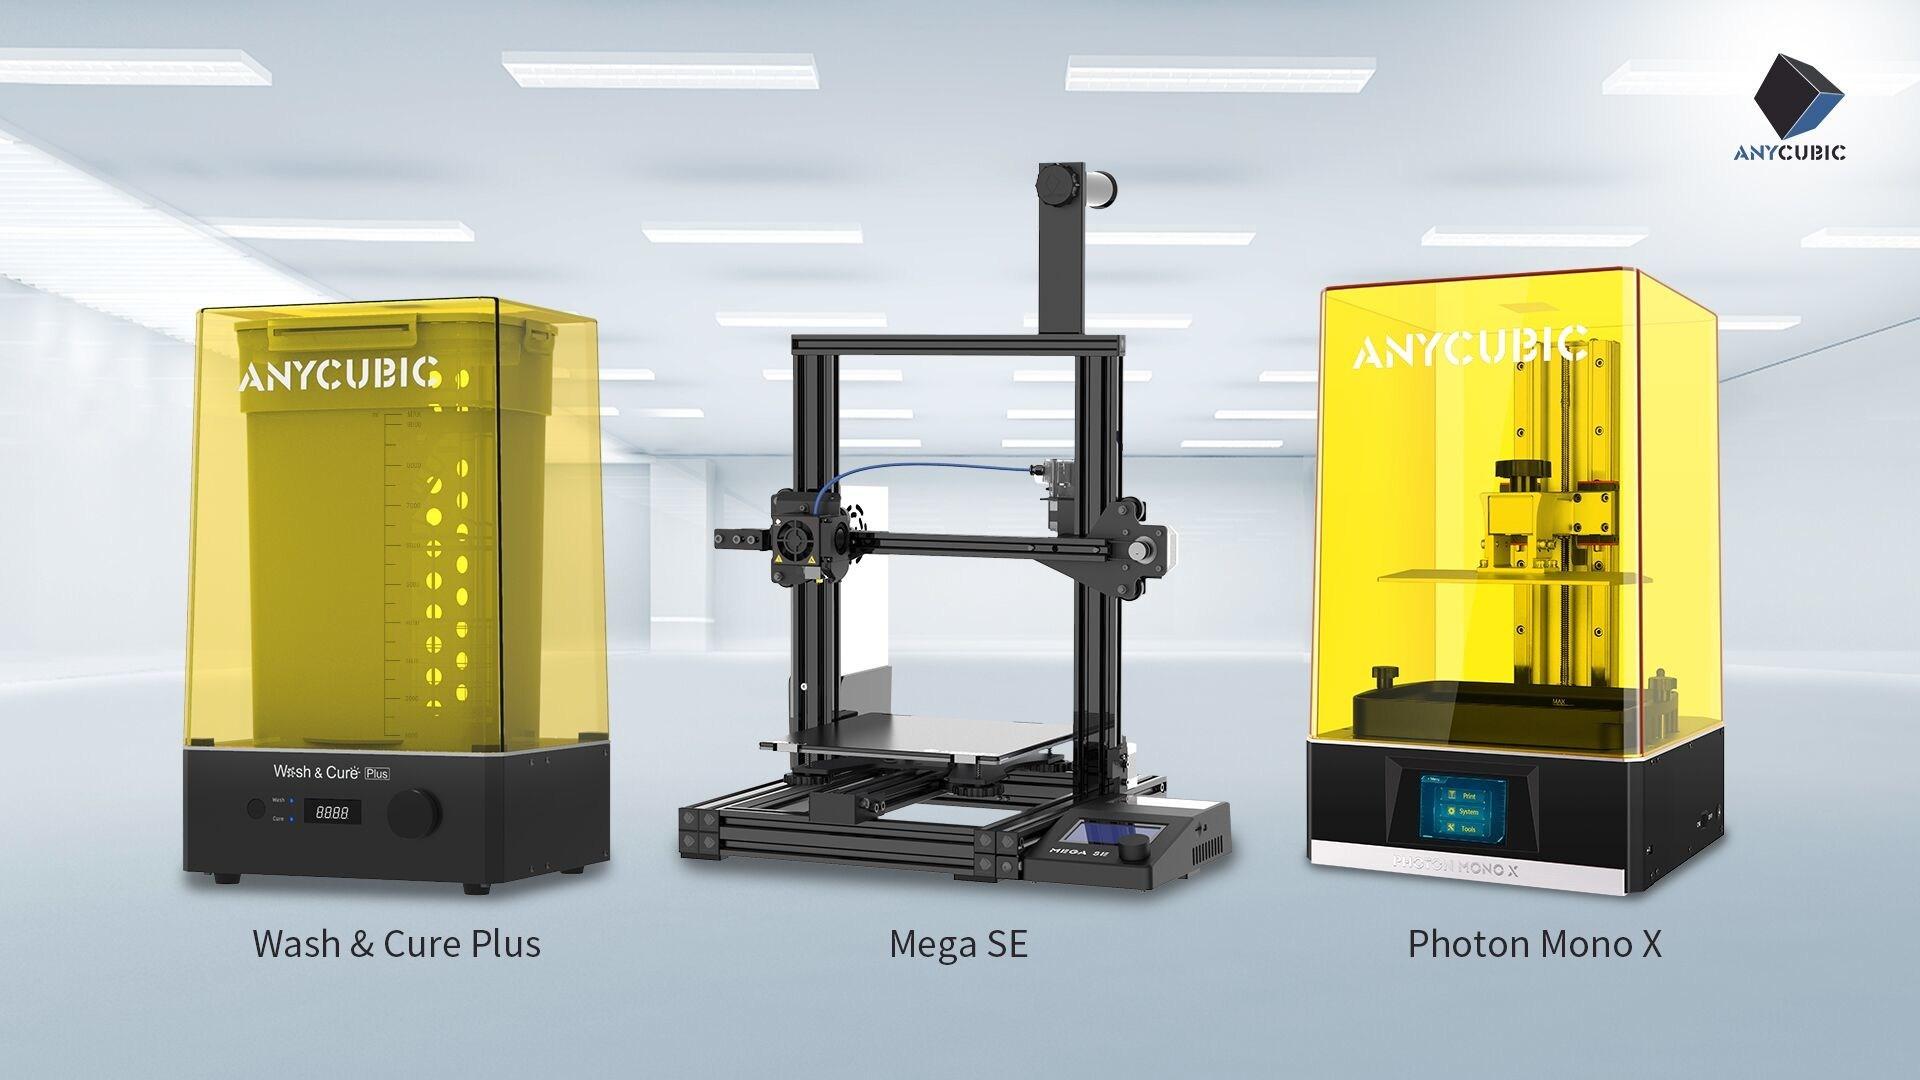 Anycubic Werbebild Photon Mono X, Mega SE und Wash & Cure Plus